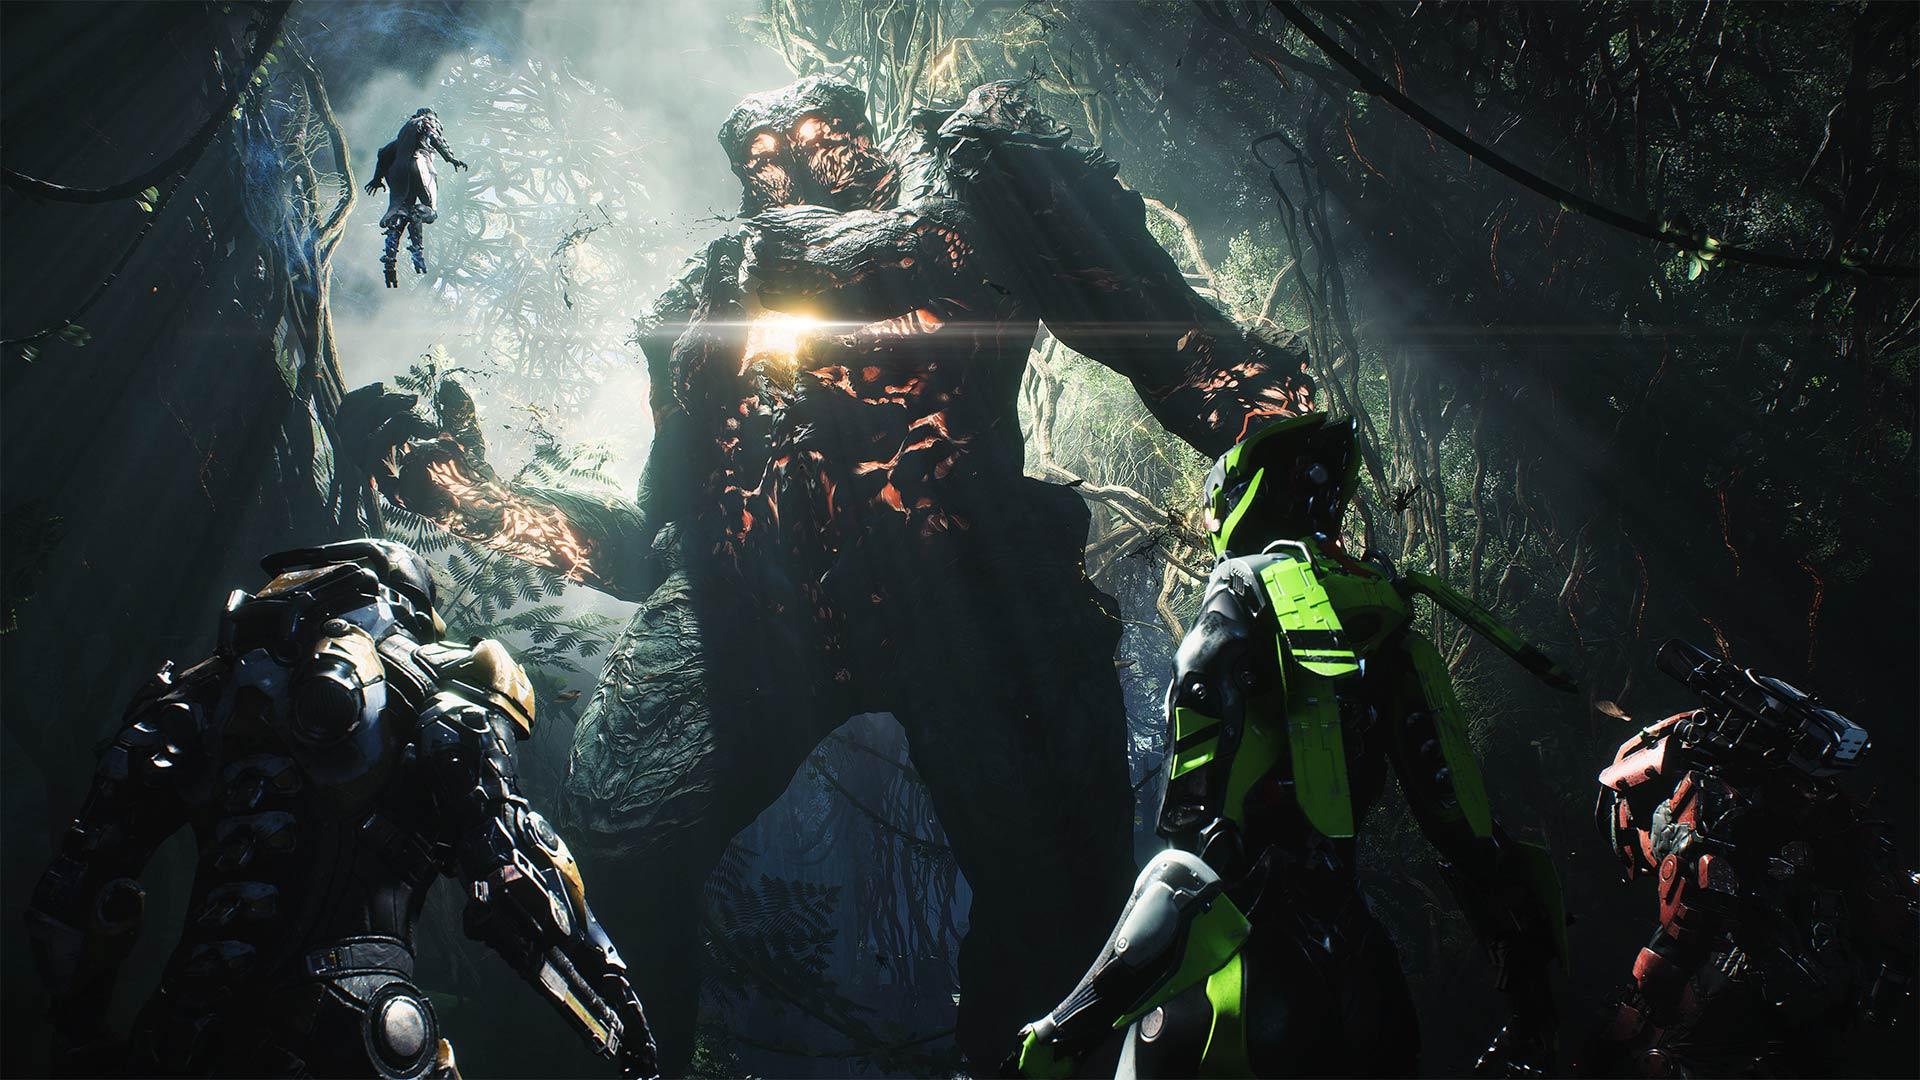 Games Inbox: Anthem Xbox One impressions, Crackdown 3 DLC, and F-Zero 99